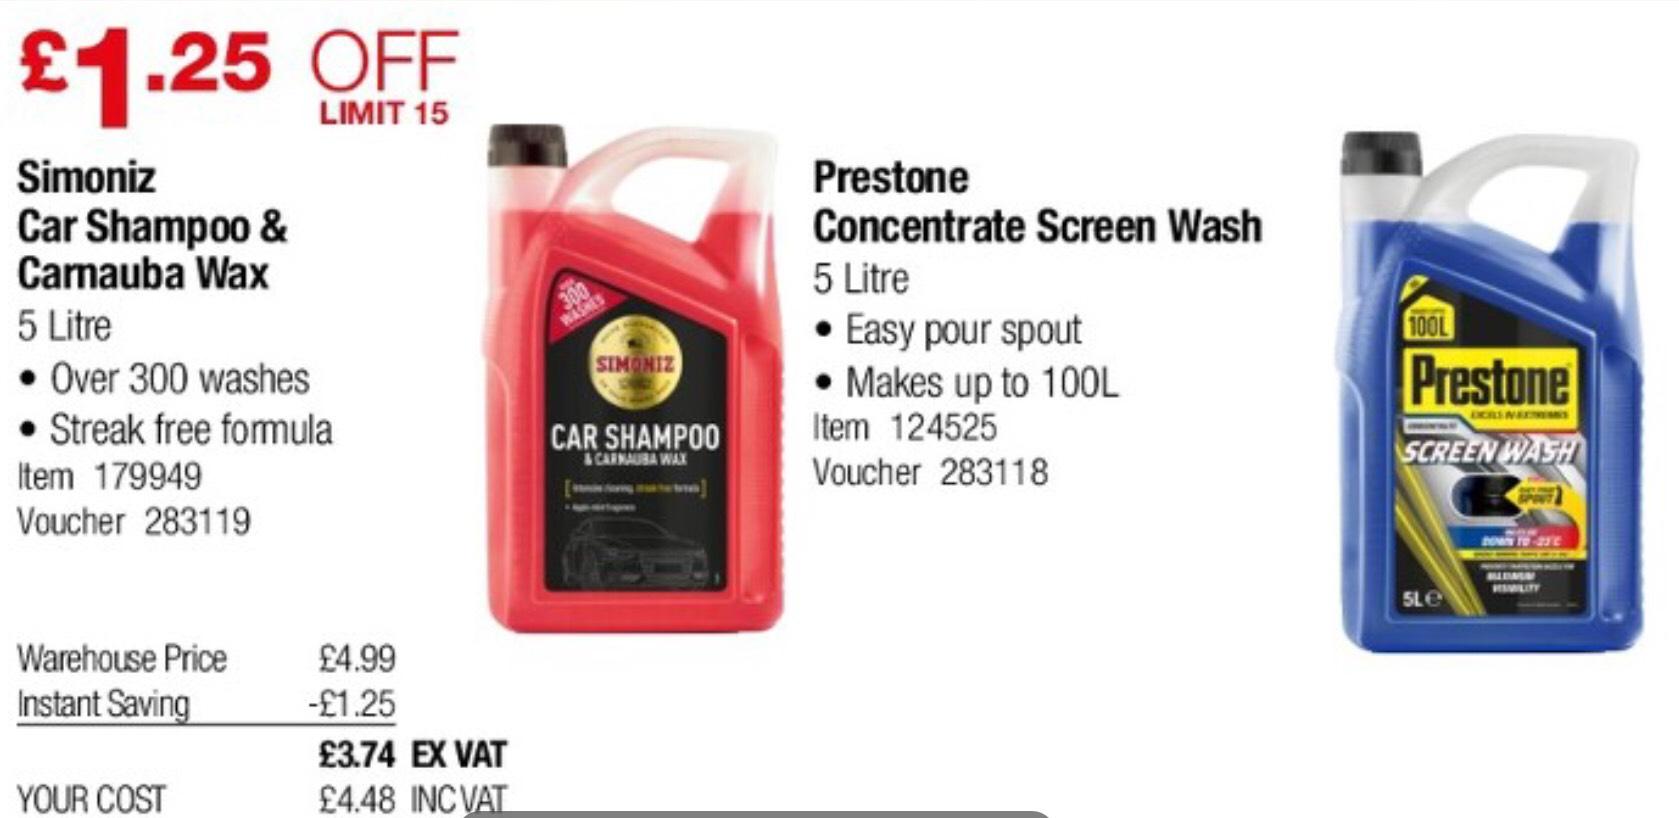 Simoniz Shampoo and Carnauba Wax 5L £4.49 @ Costco